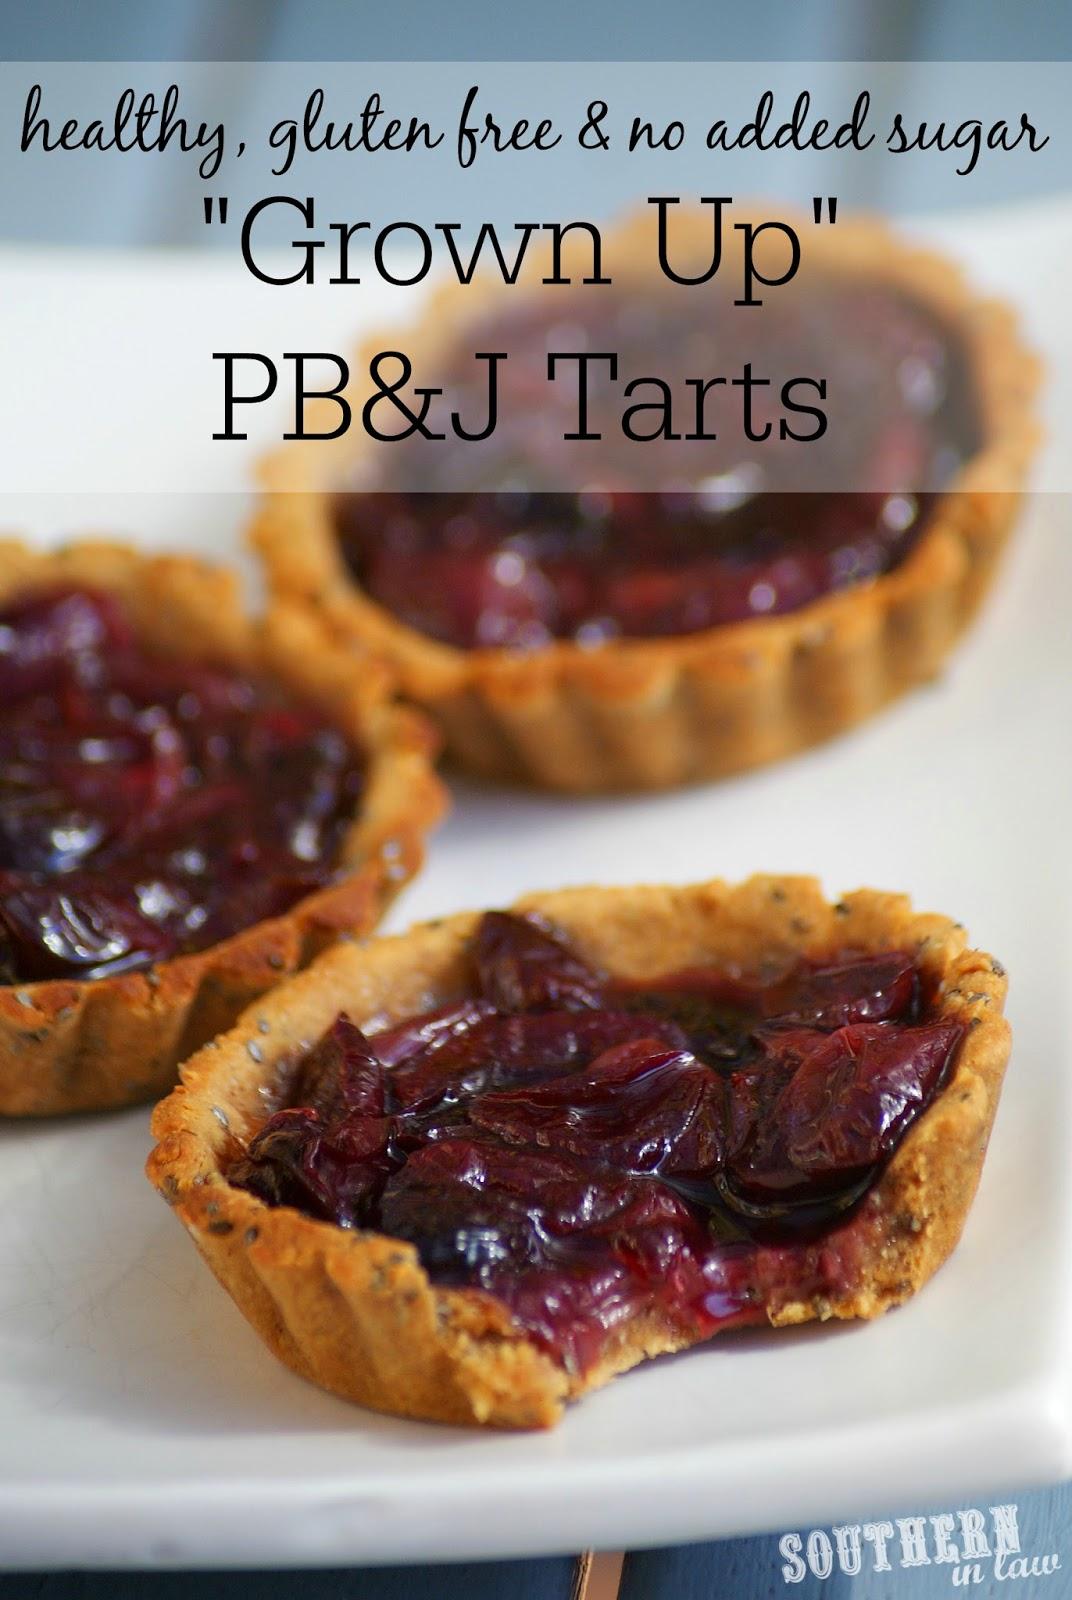 Grown Up Healthy PB&J Tarts Recipe - gluten free, refined sugar free, clean eating friendly, healthy, low fat